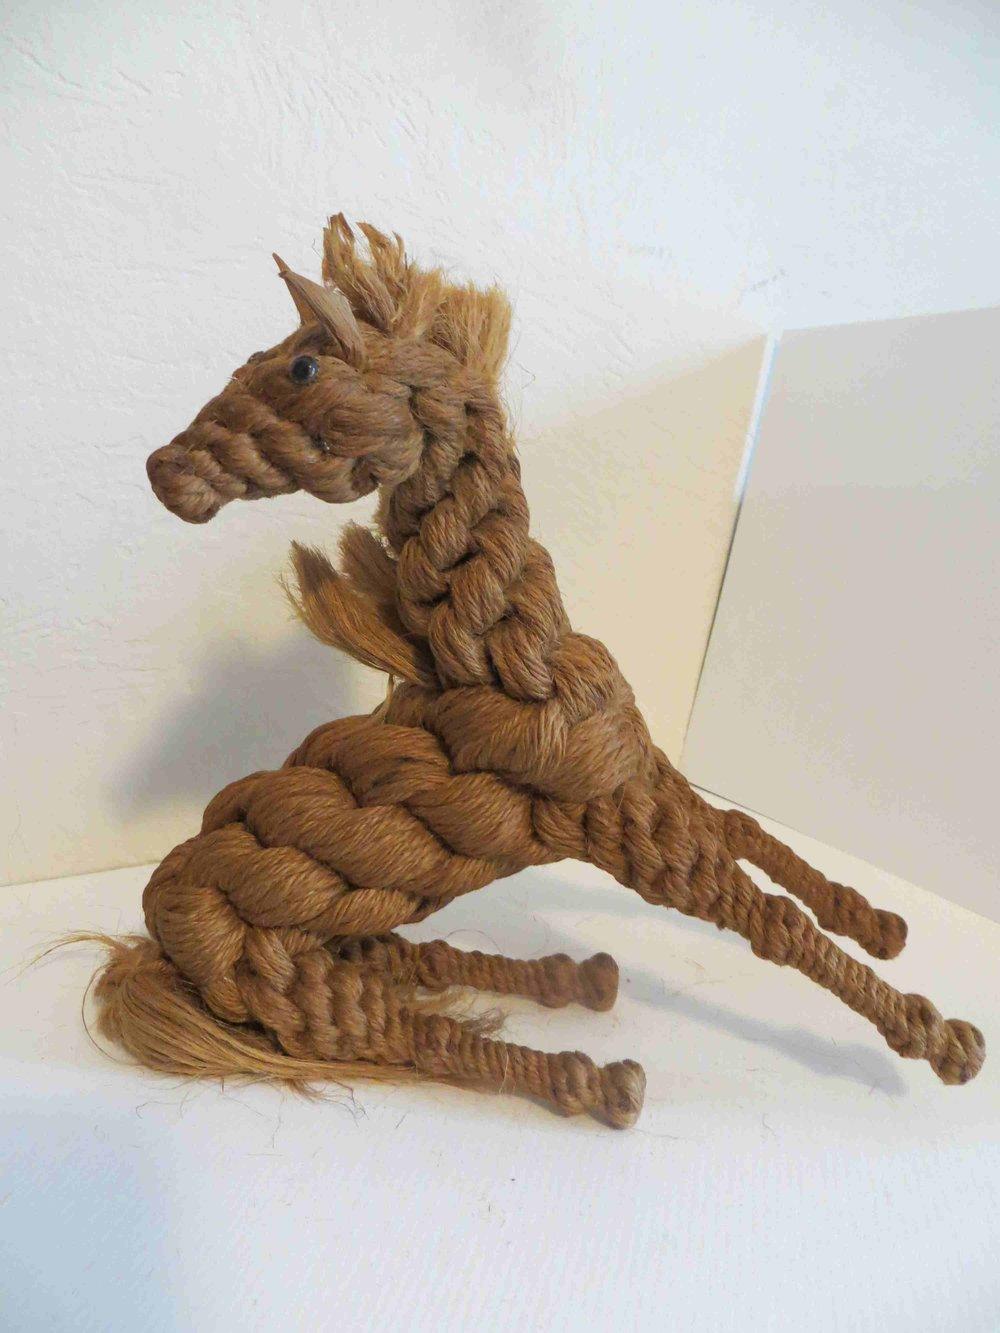 Twine Horse sculpture by Raiford FL INmate ARtist-022.jpg